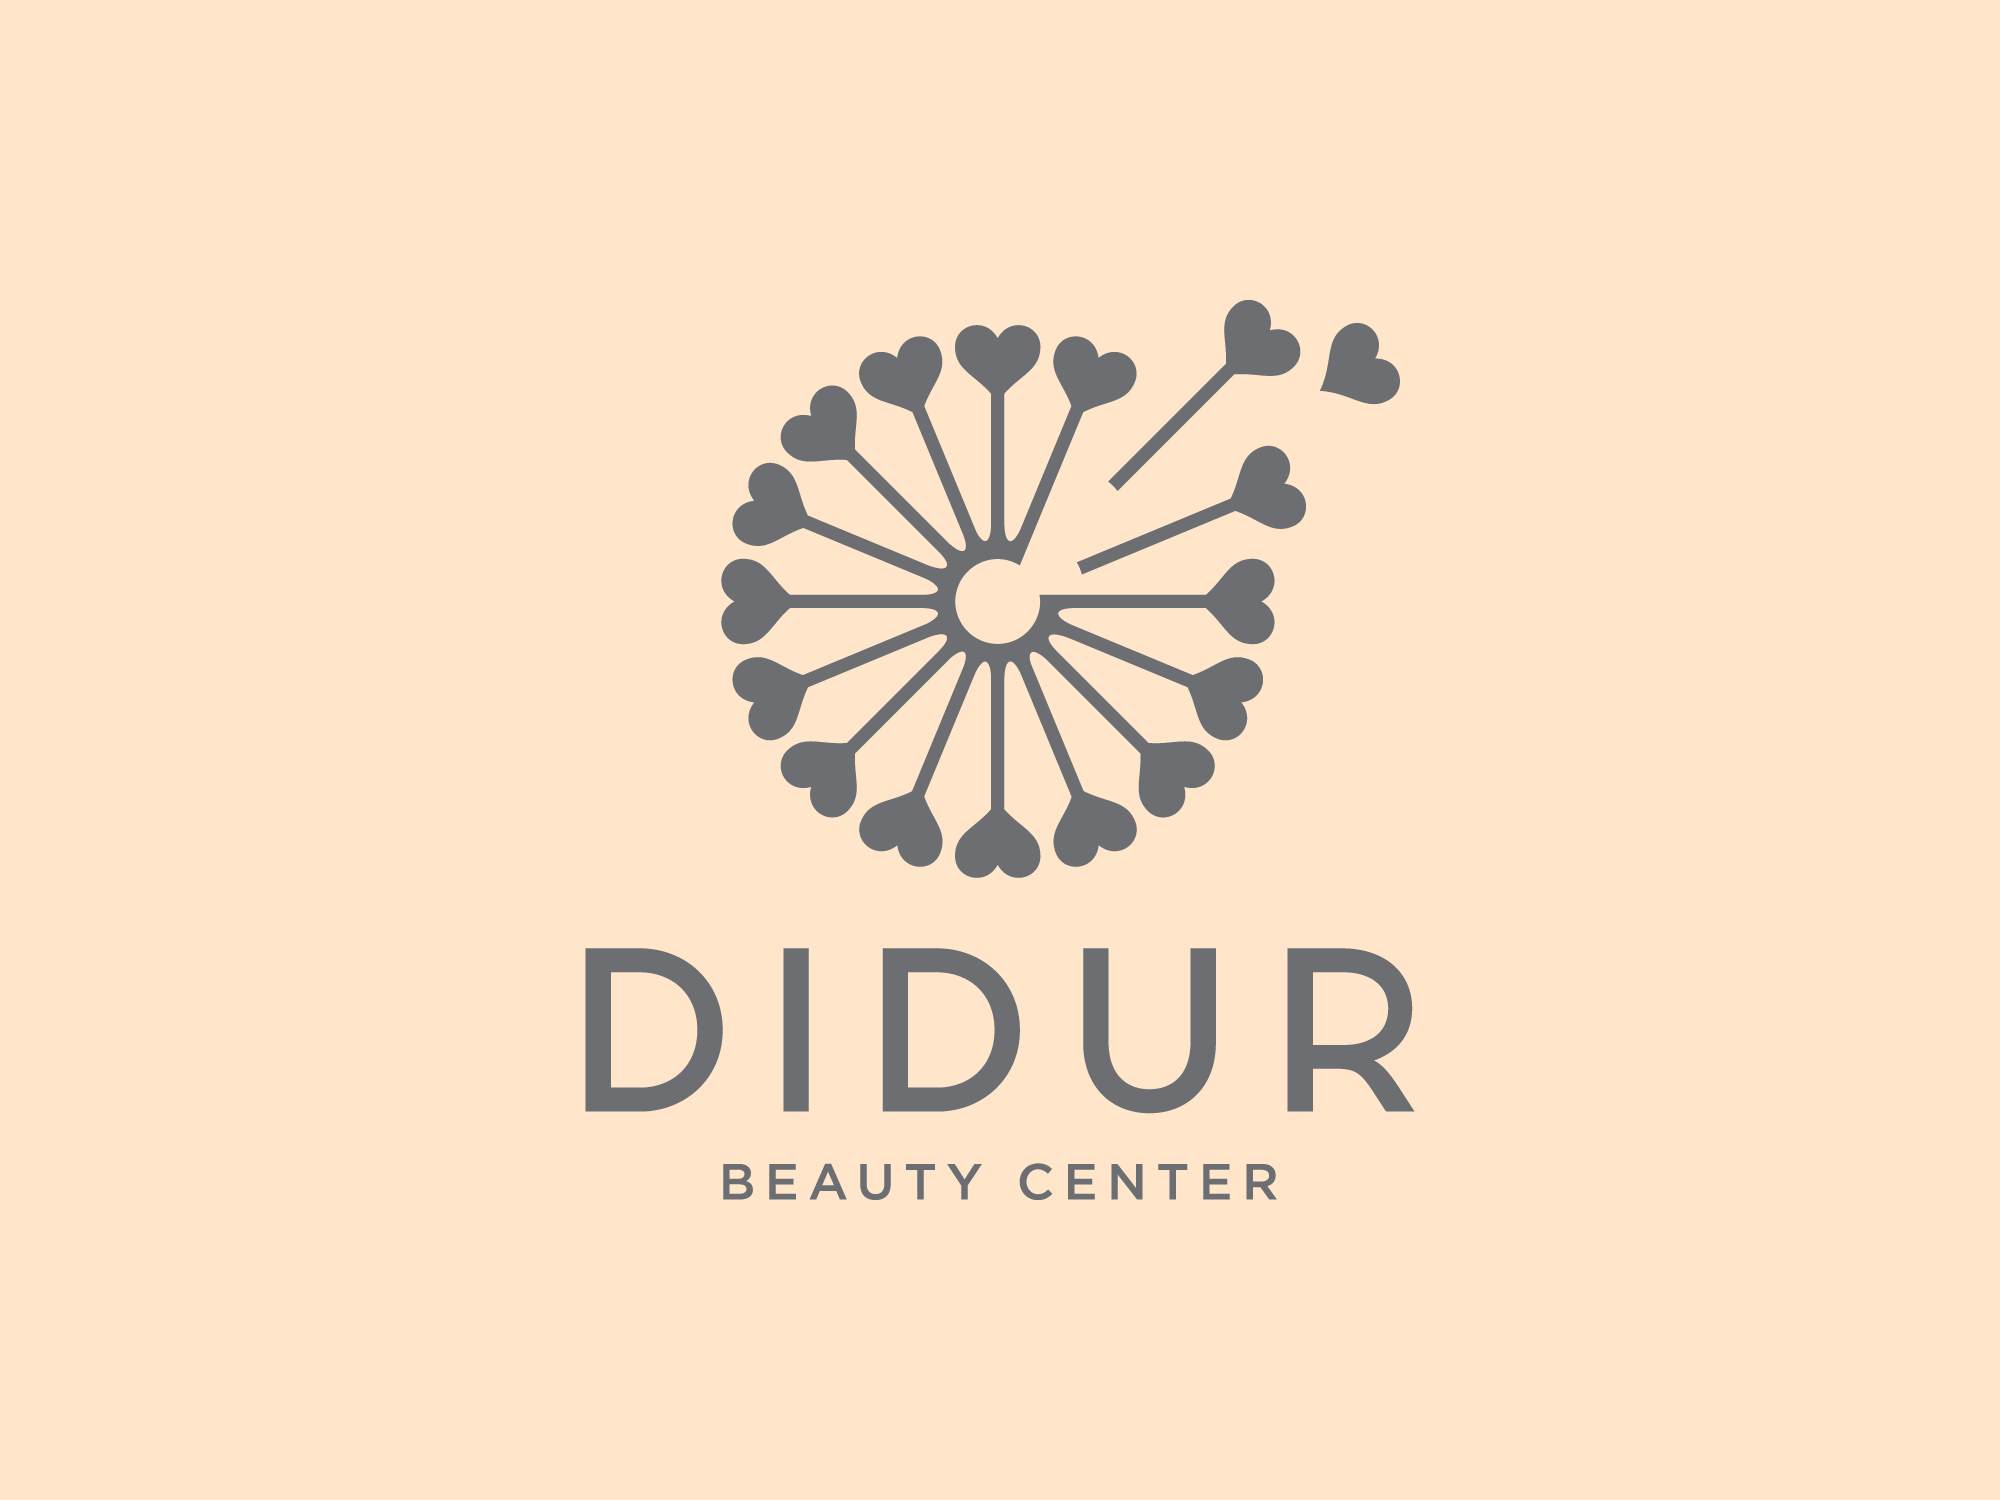 dandelion with hearth shape didur beauty center logo